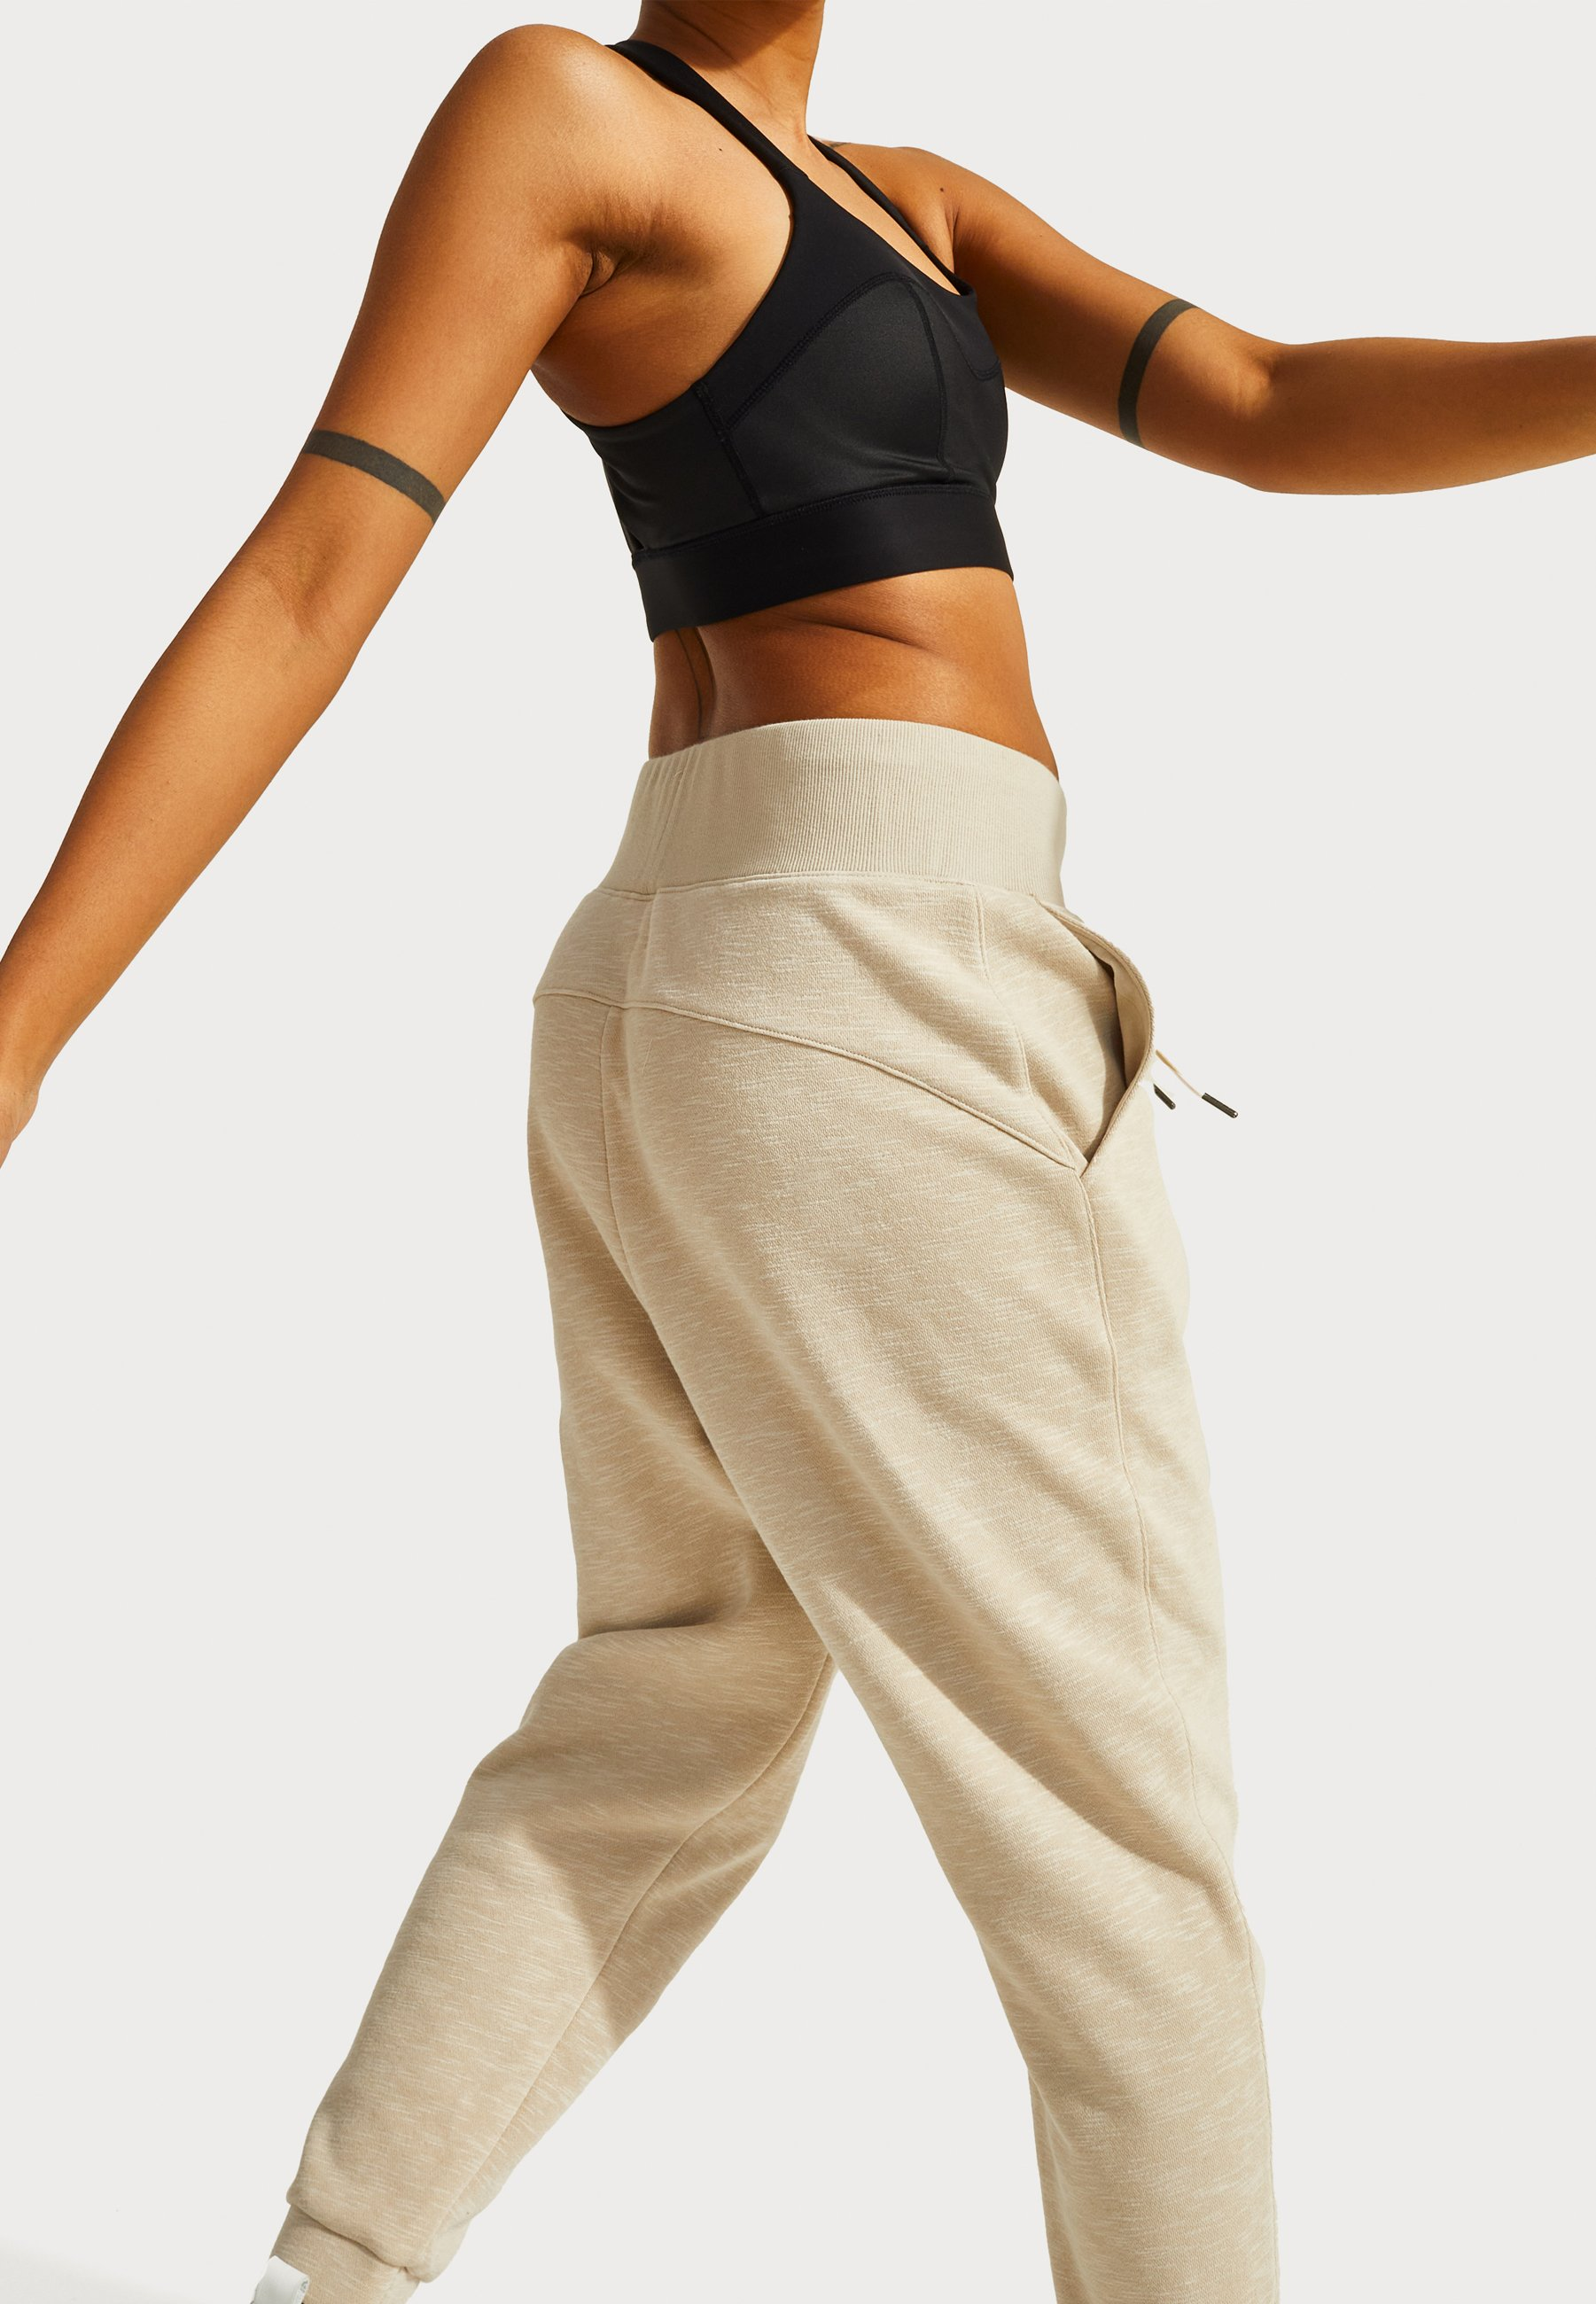 Donna SWEATY BETTY X HALLE BERRY GINGER ESSENTIALS - Pantaloni sportivi